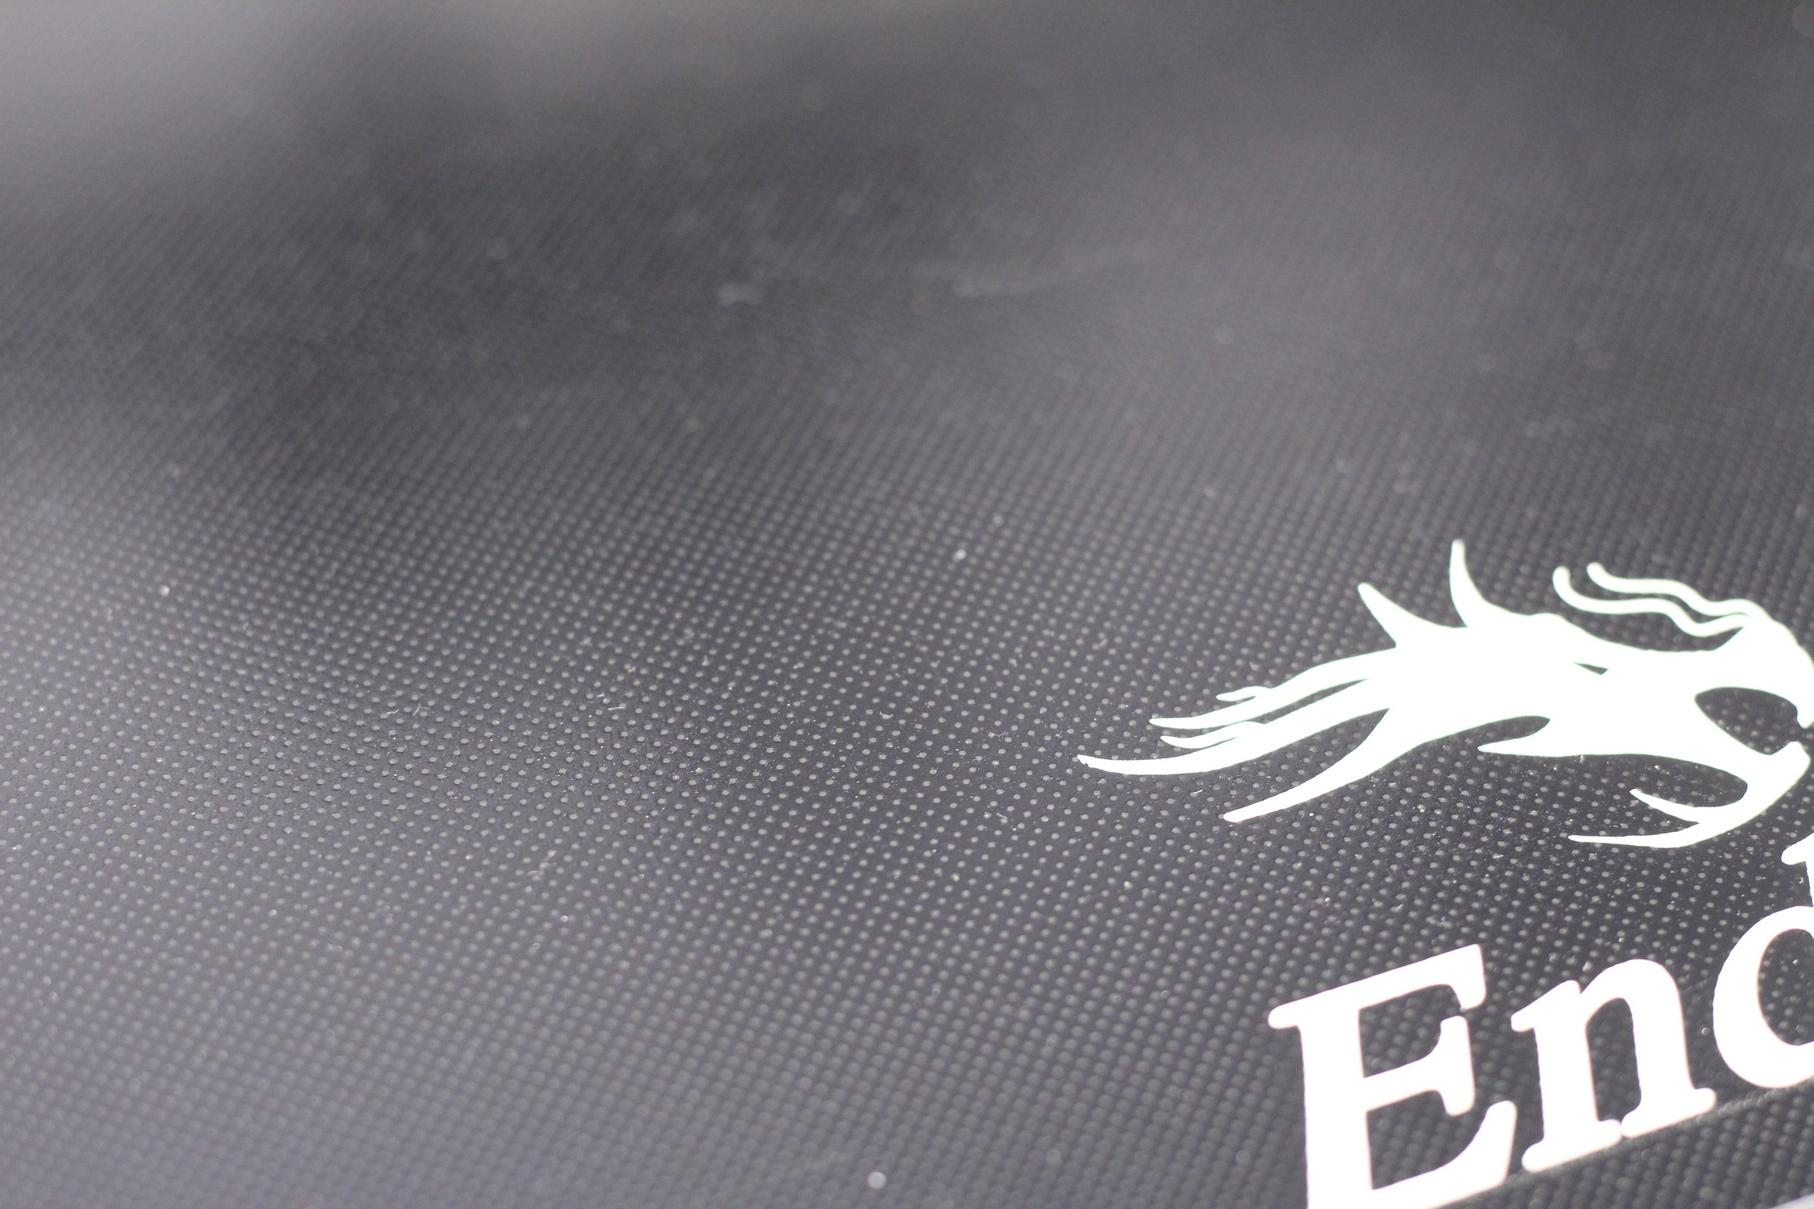 Ender-3-Max-Review-Carborundum-glass-print-surface-1